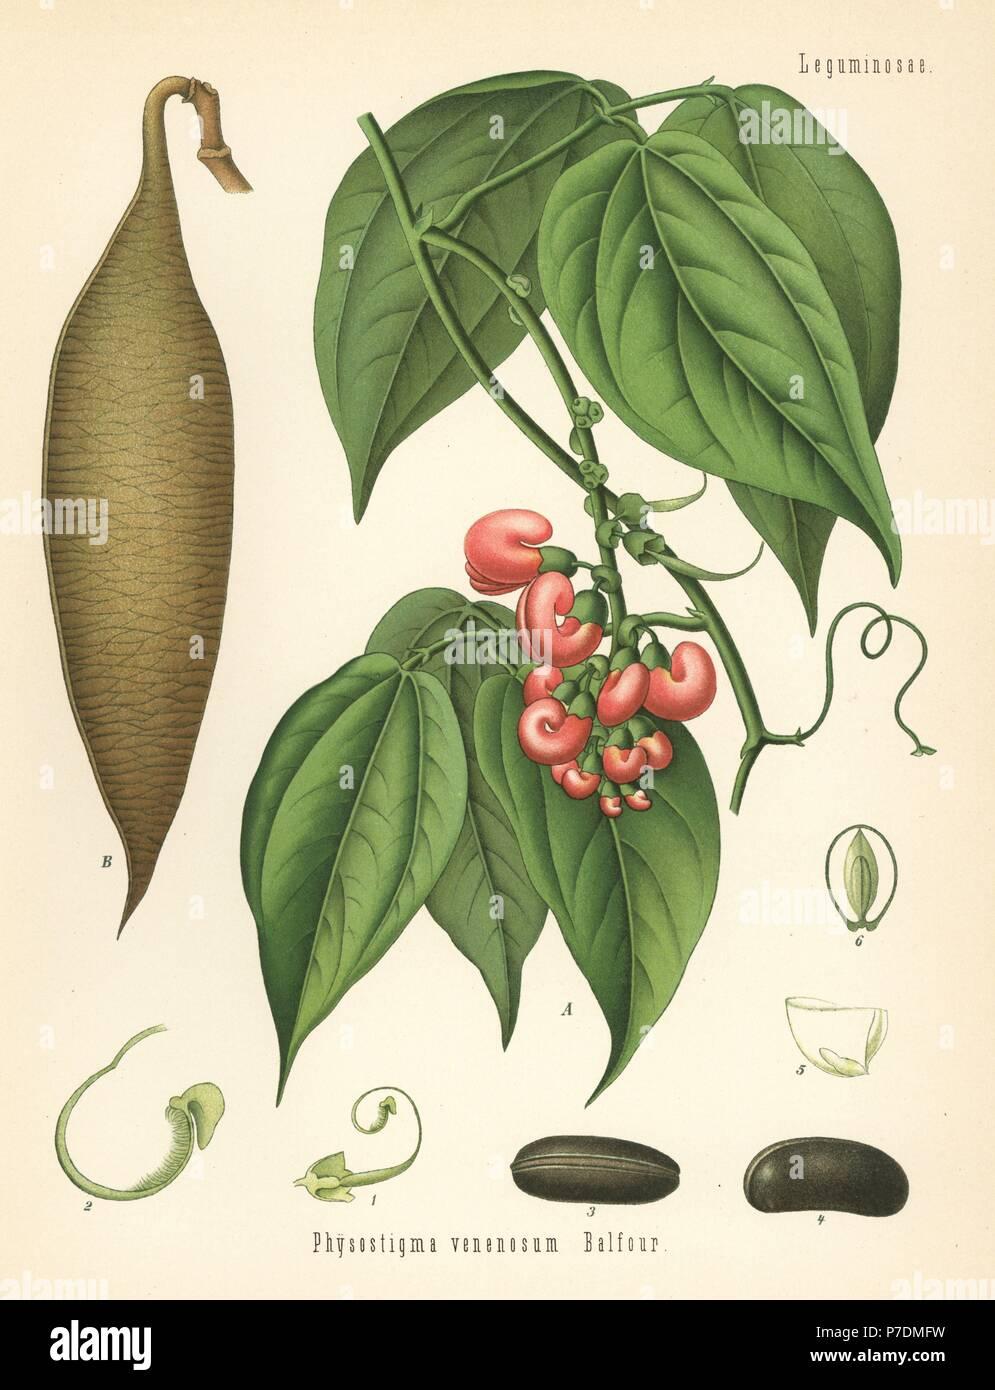 Physostigma venenosum $15 christmas gift ideas